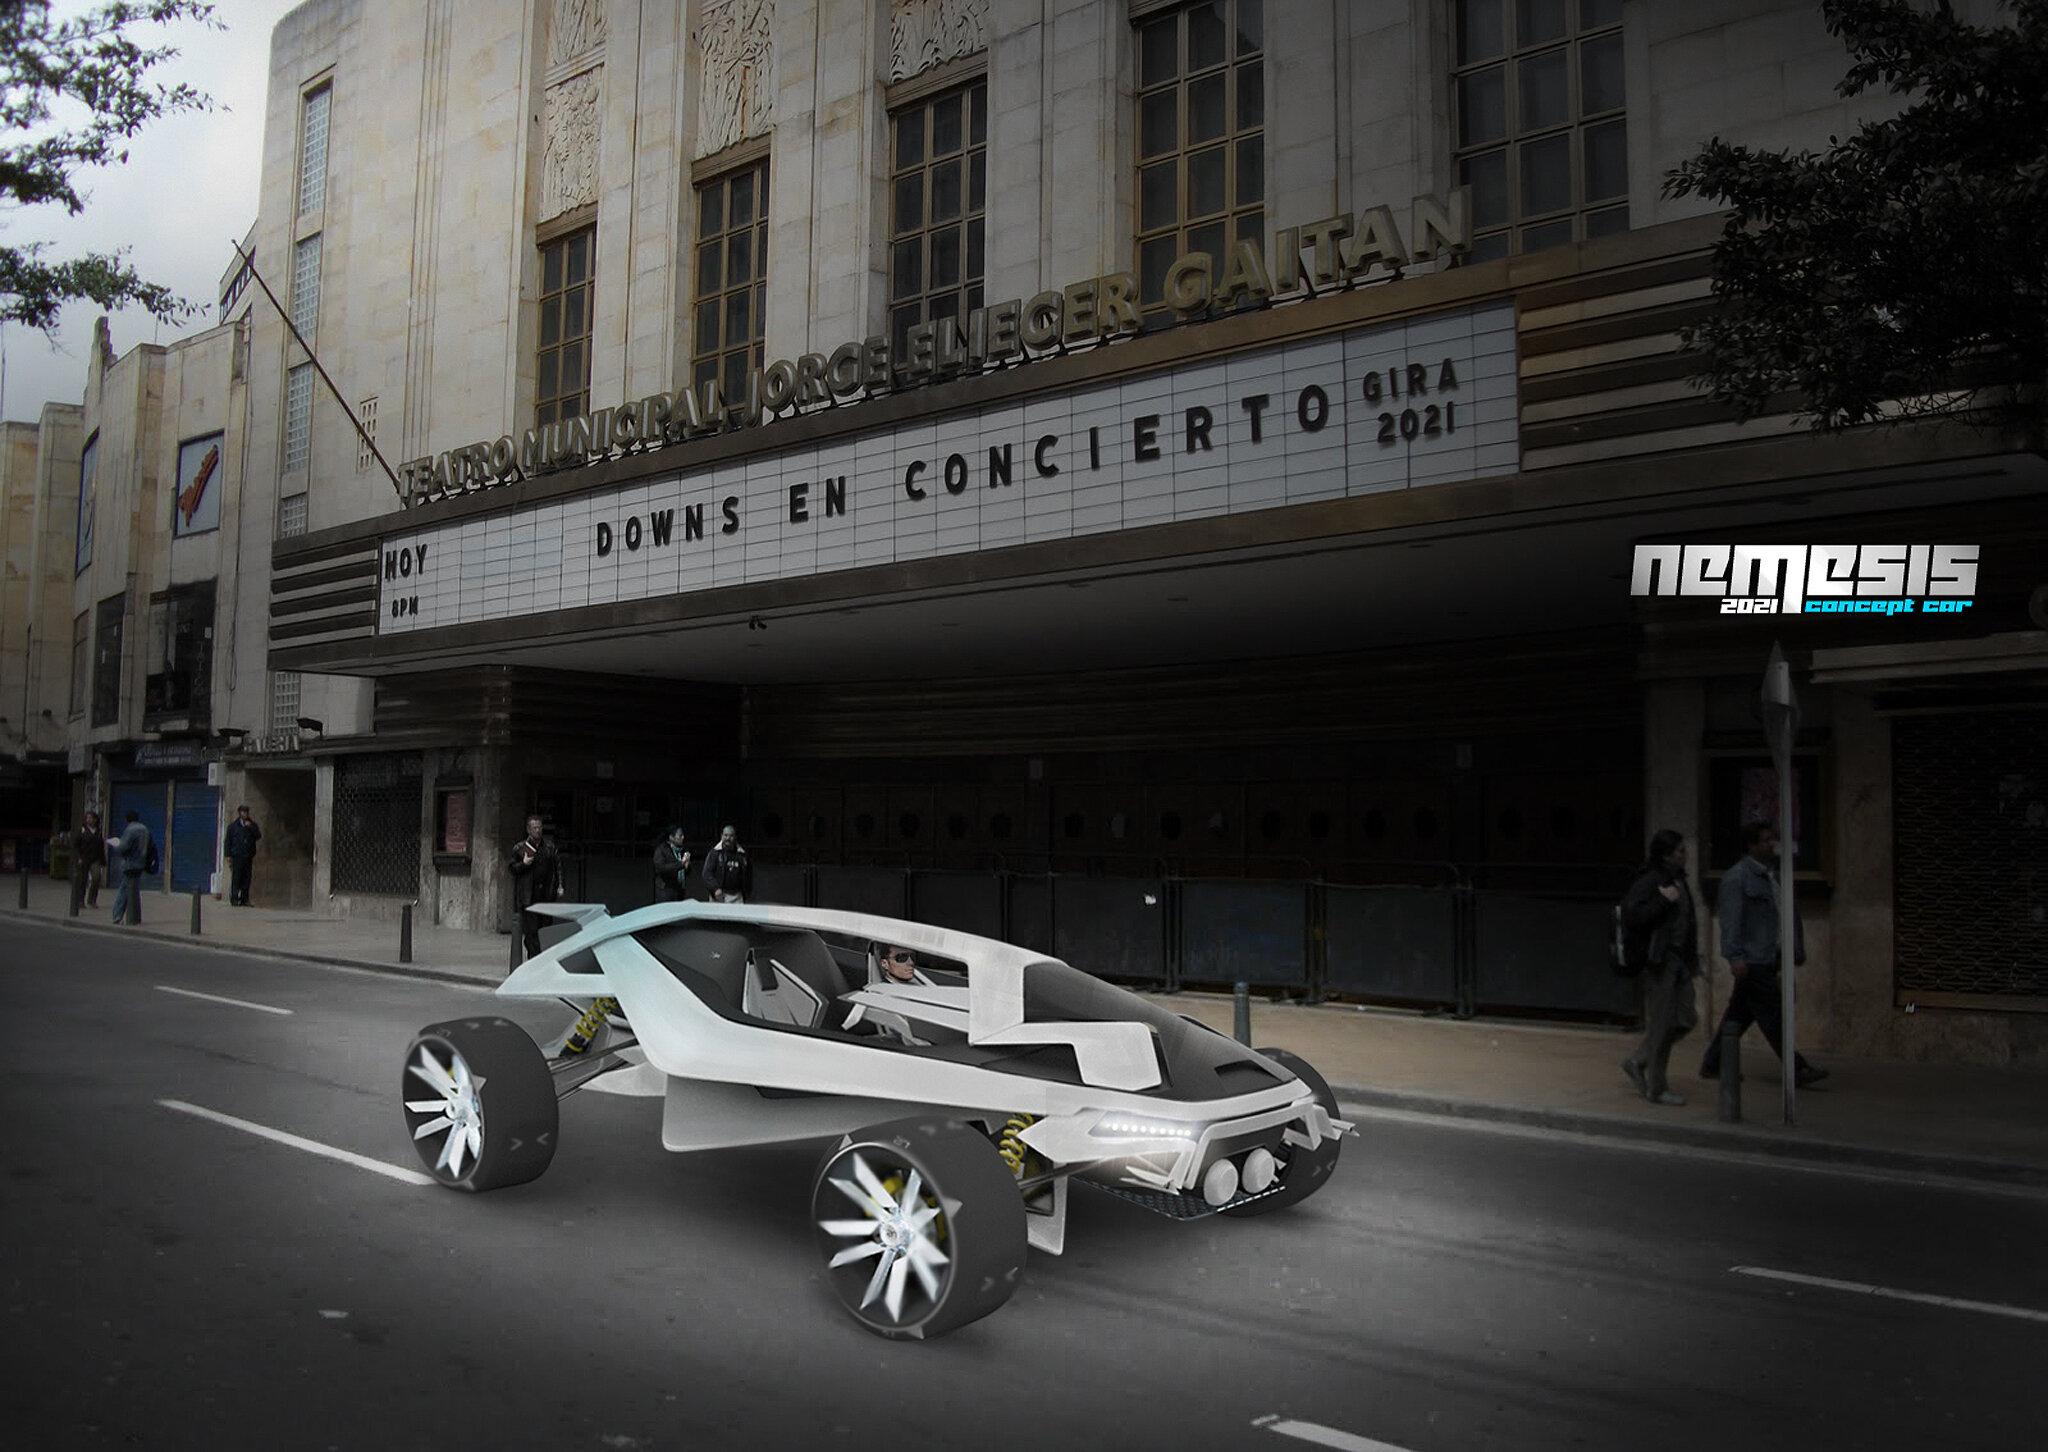 Nemesis_concept_car_final_07_source.jpg